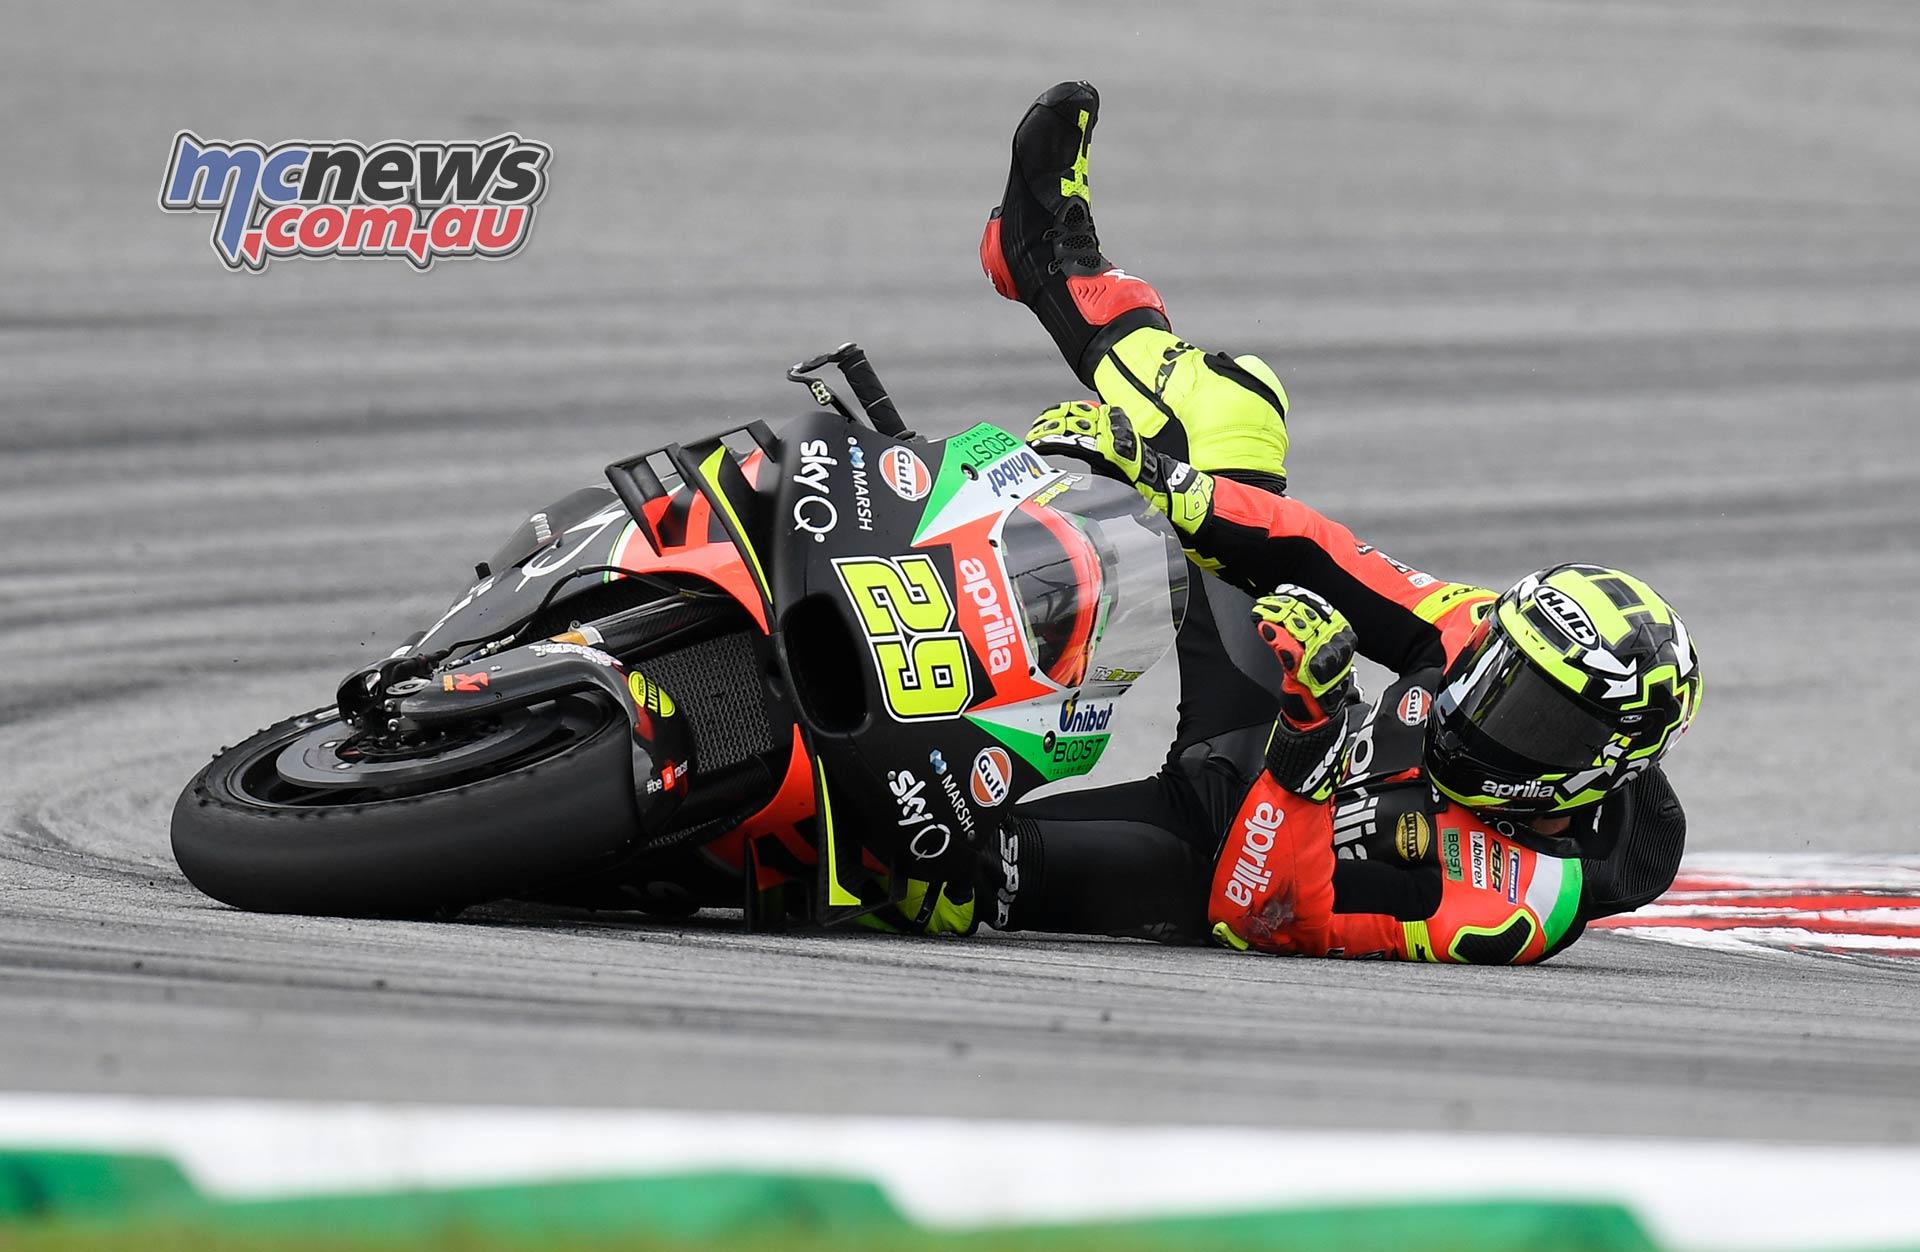 MotoGP Rnd Malaysia Iannone